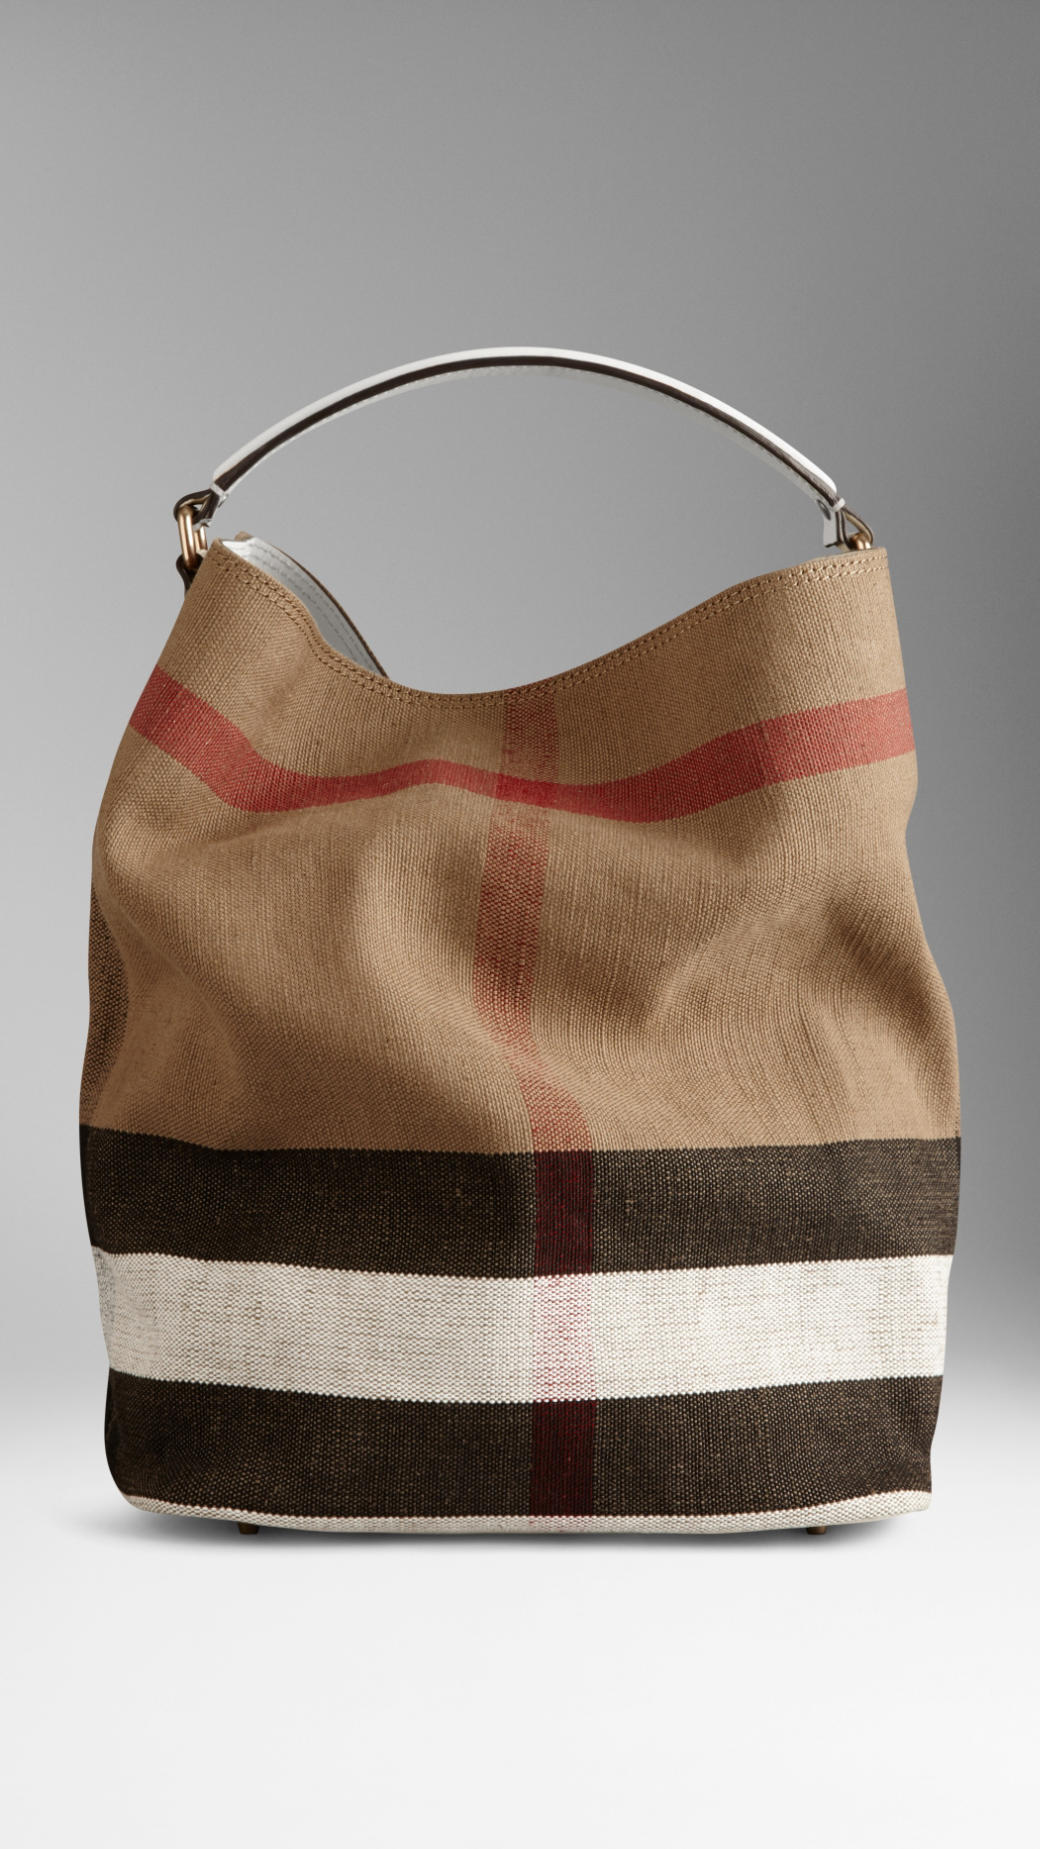 sac burberry pas cher hobo medium le sac main. Black Bedroom Furniture Sets. Home Design Ideas